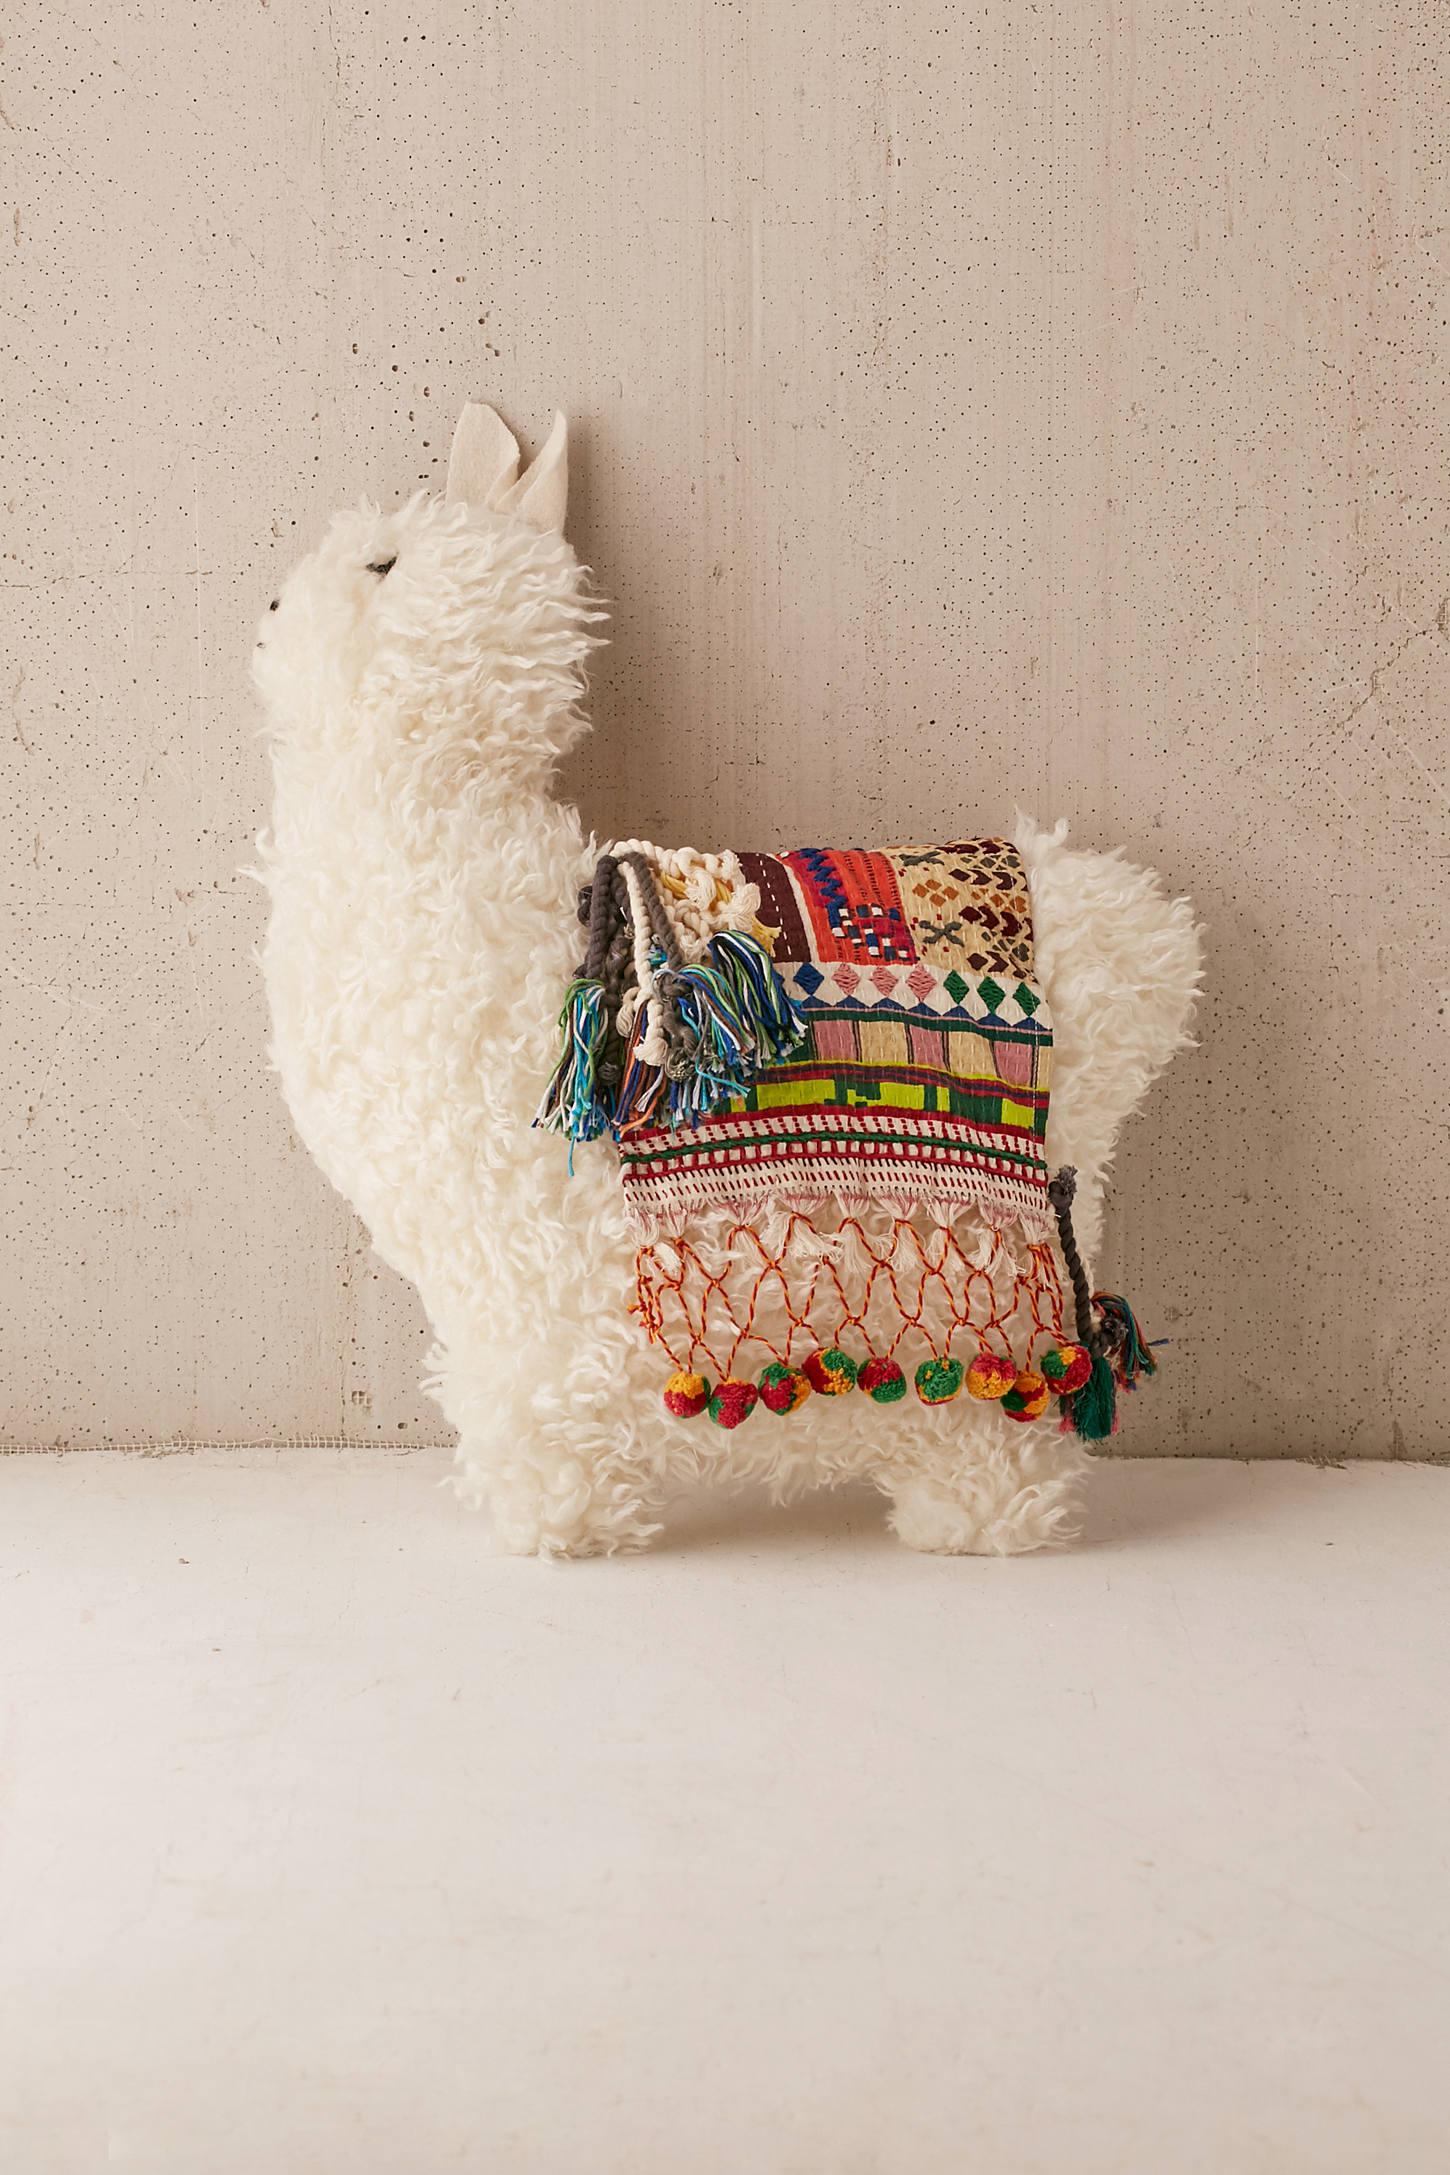 Pillow Picture Throw Pillows Decorative Throw Pillows